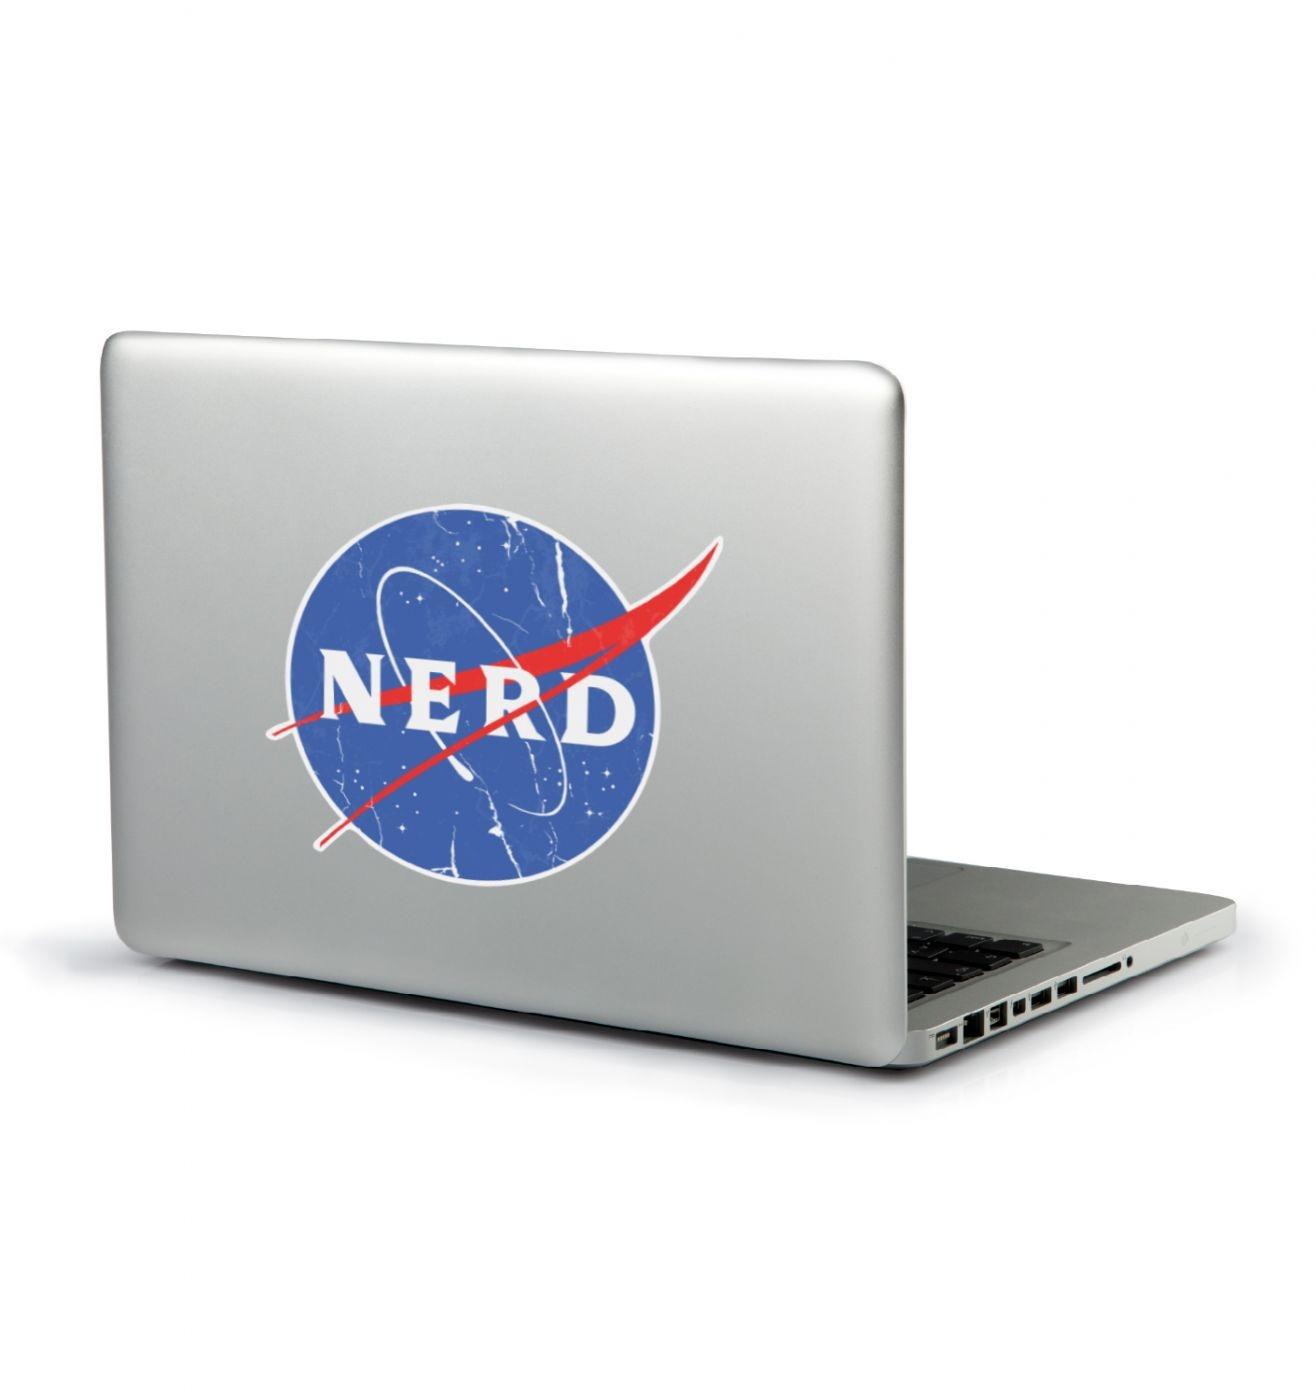 Distressed NASA NERD laptop sticker